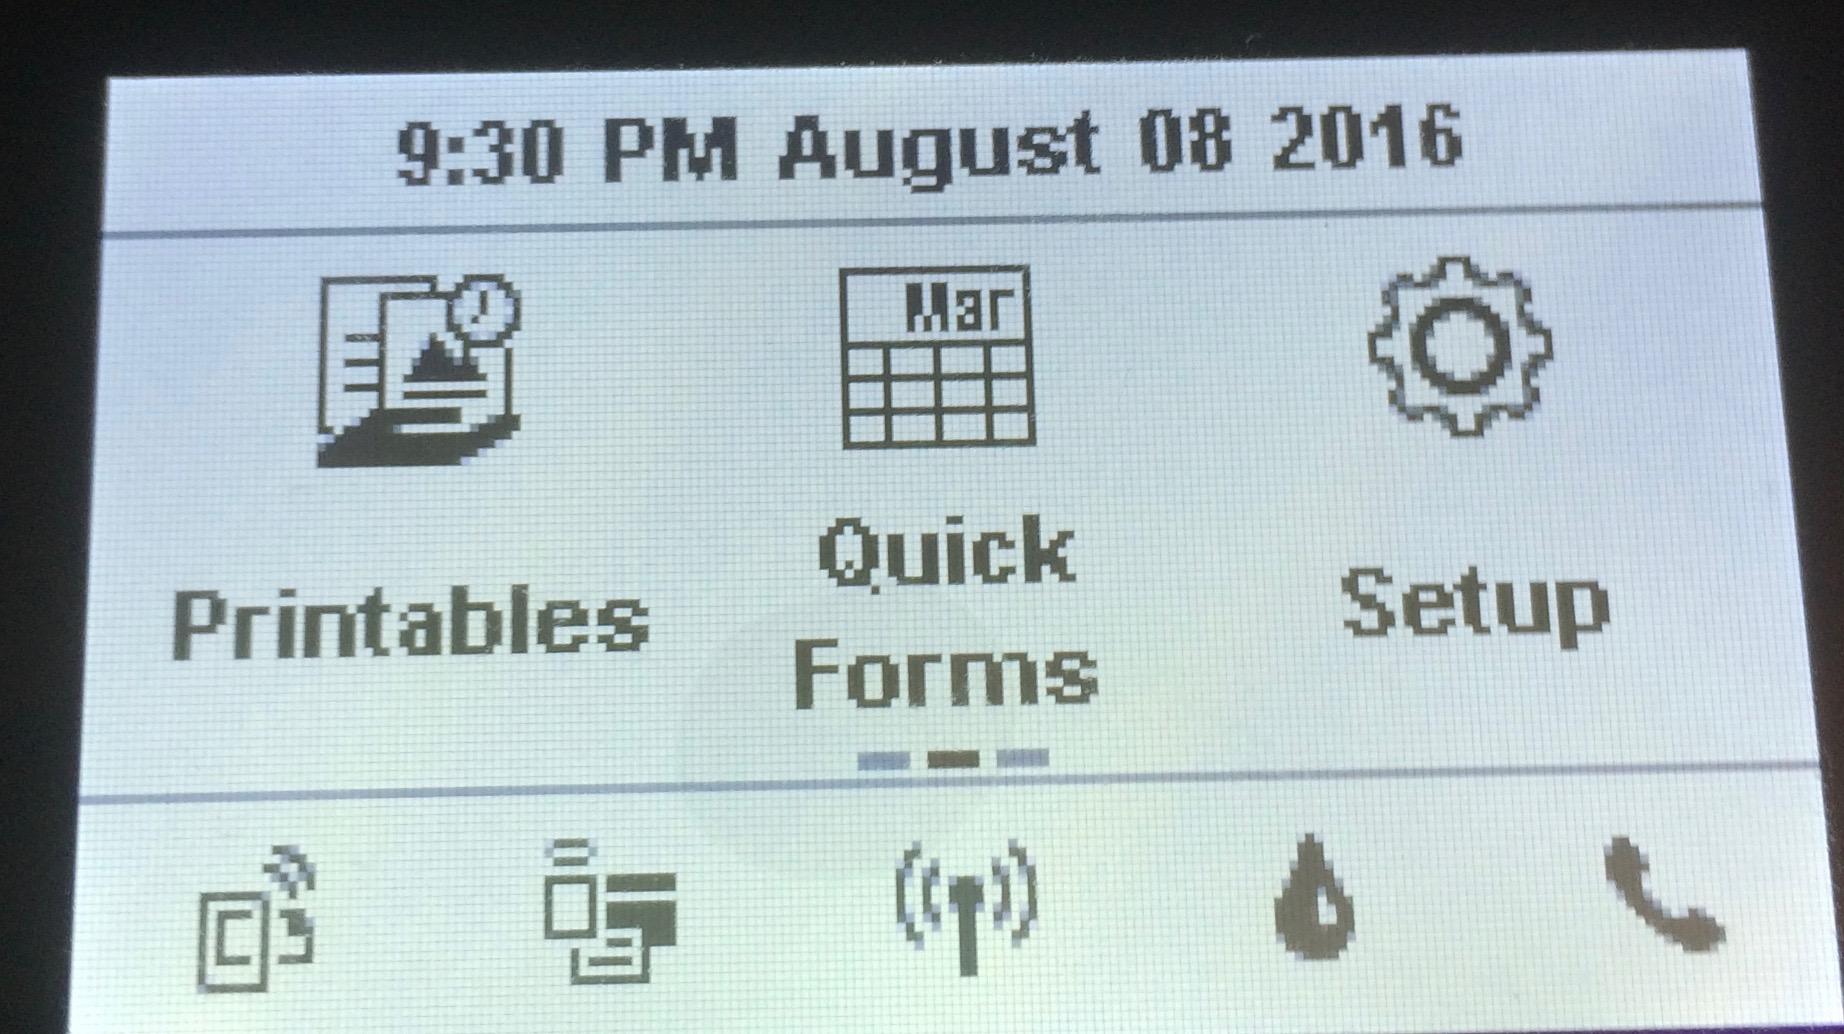 Deskjet Ink Advantage 3835 - Scan to Email - HP Support Forum - 5719746